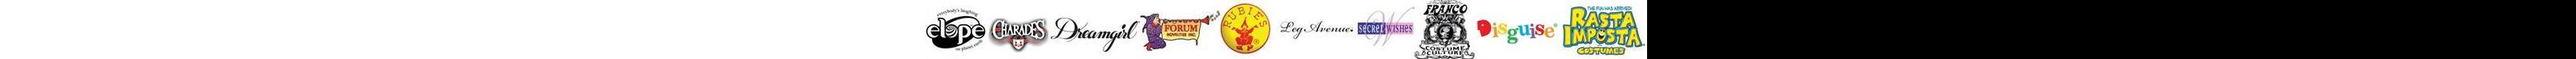 rubies charades dreamgirl logos